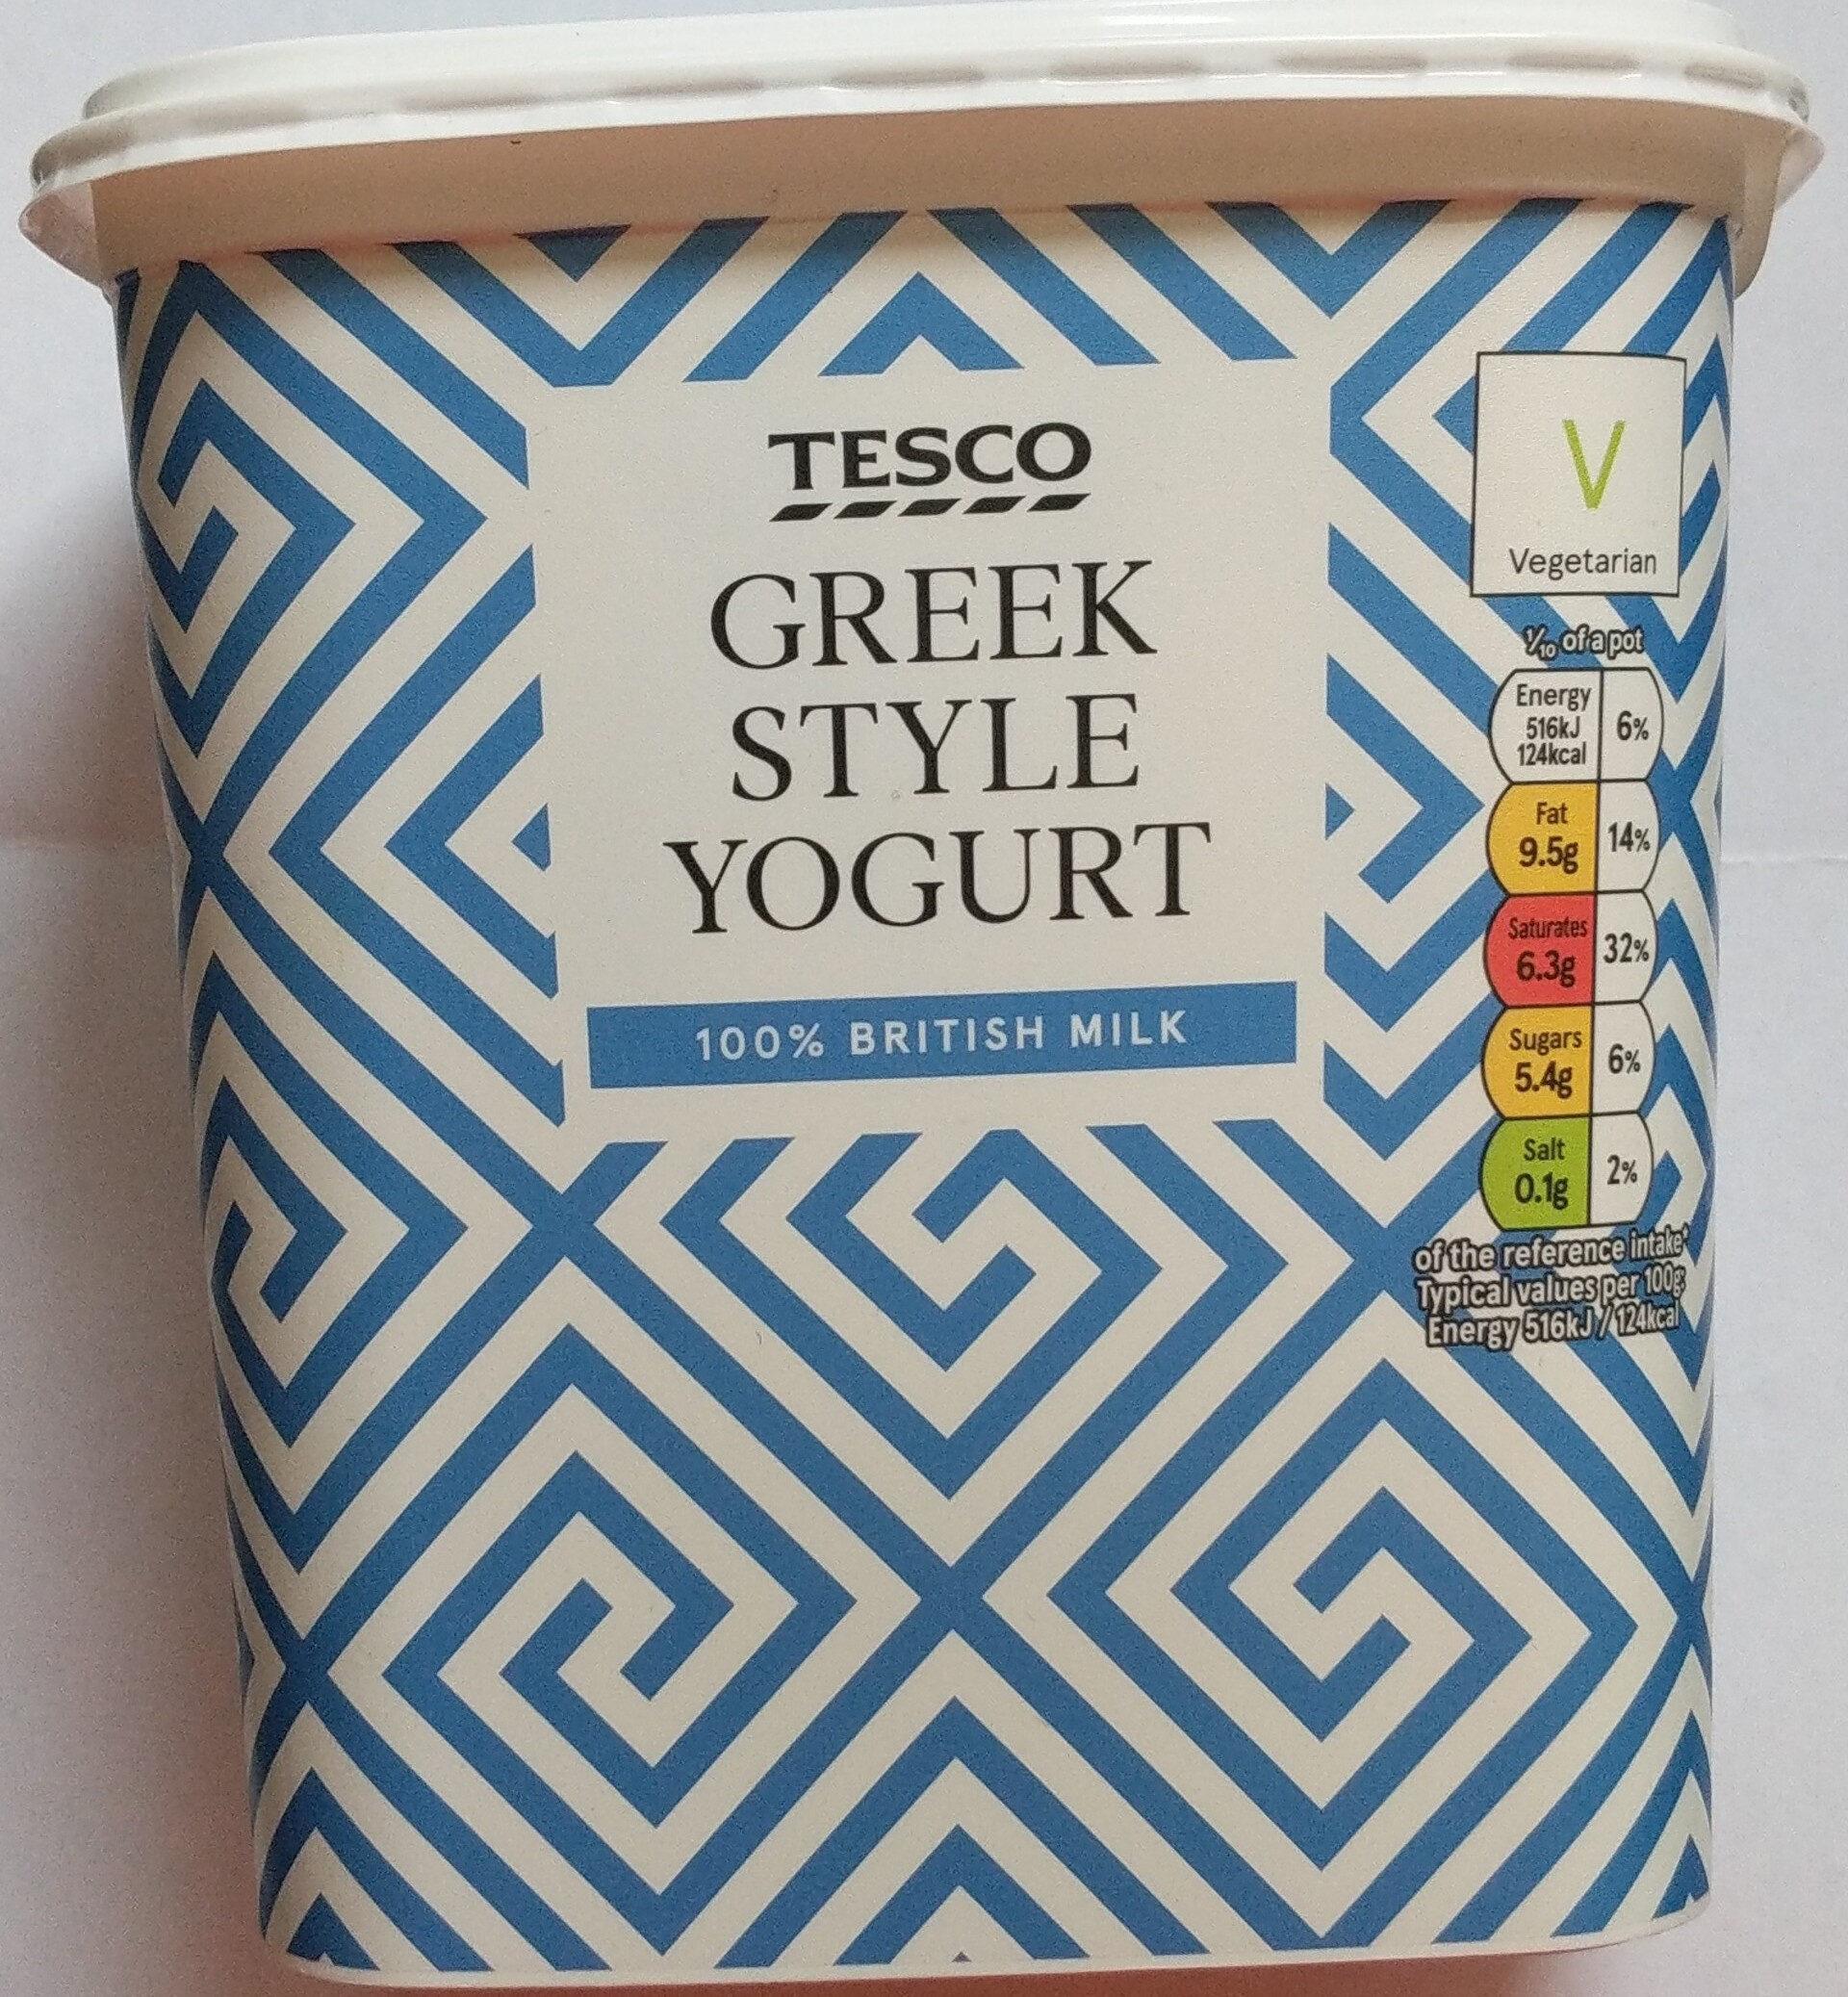 Greek style yoghurt - Product - en